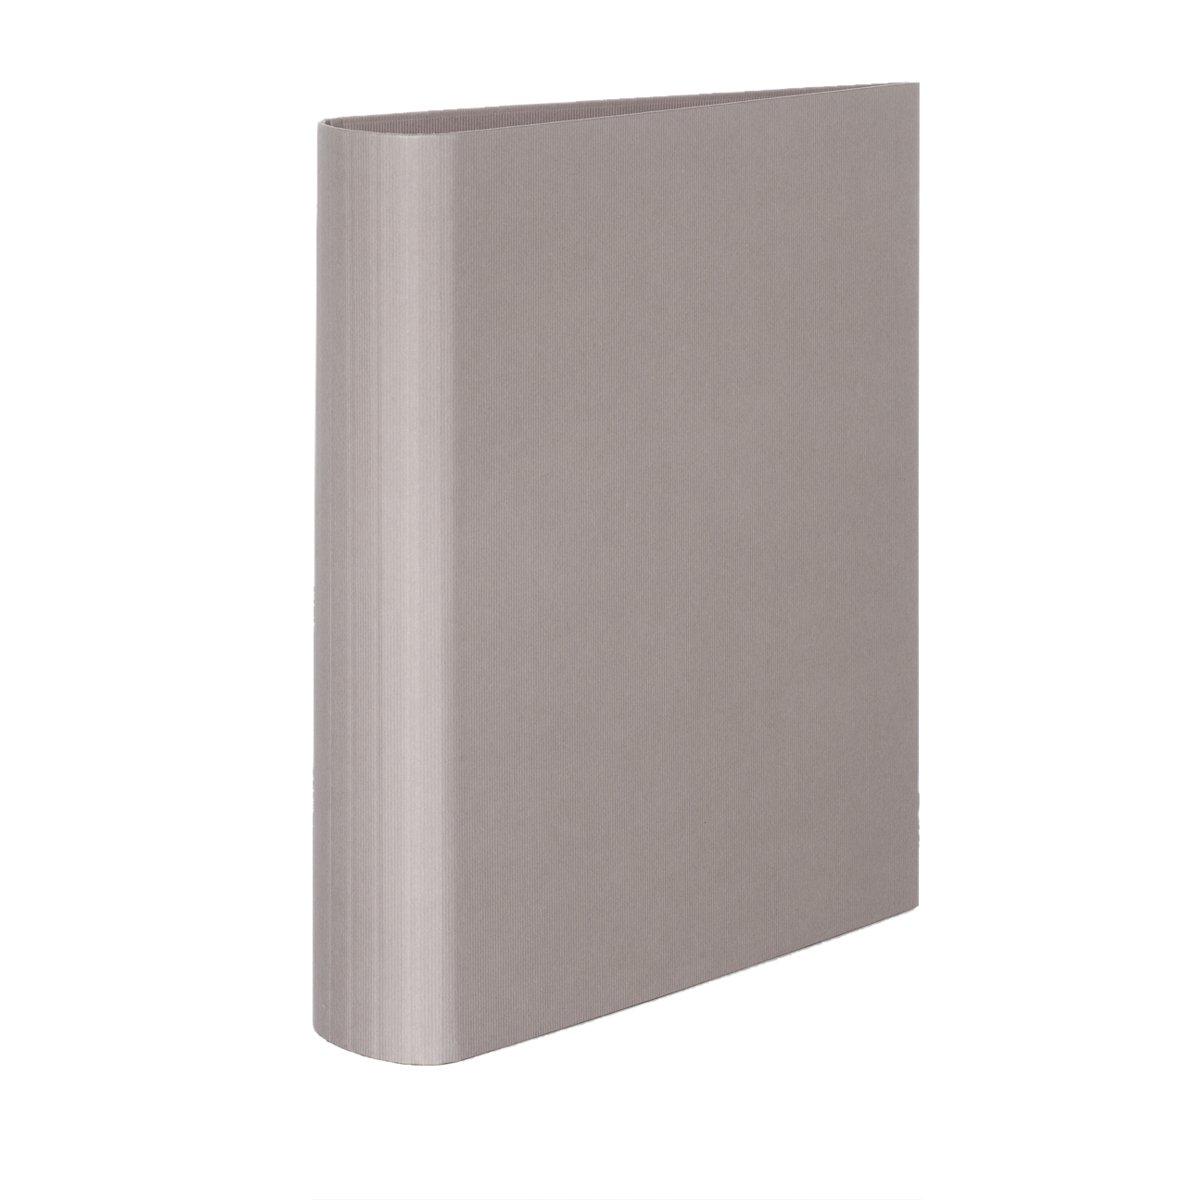 Rössler Papier - - S.O.H.O. Taupe - Ringbuch(4) für DIN A4, Füllhöhe 50mm - Liefermenge  3 Stück B07CX8QX6L   Elegante und robuste Verpackung